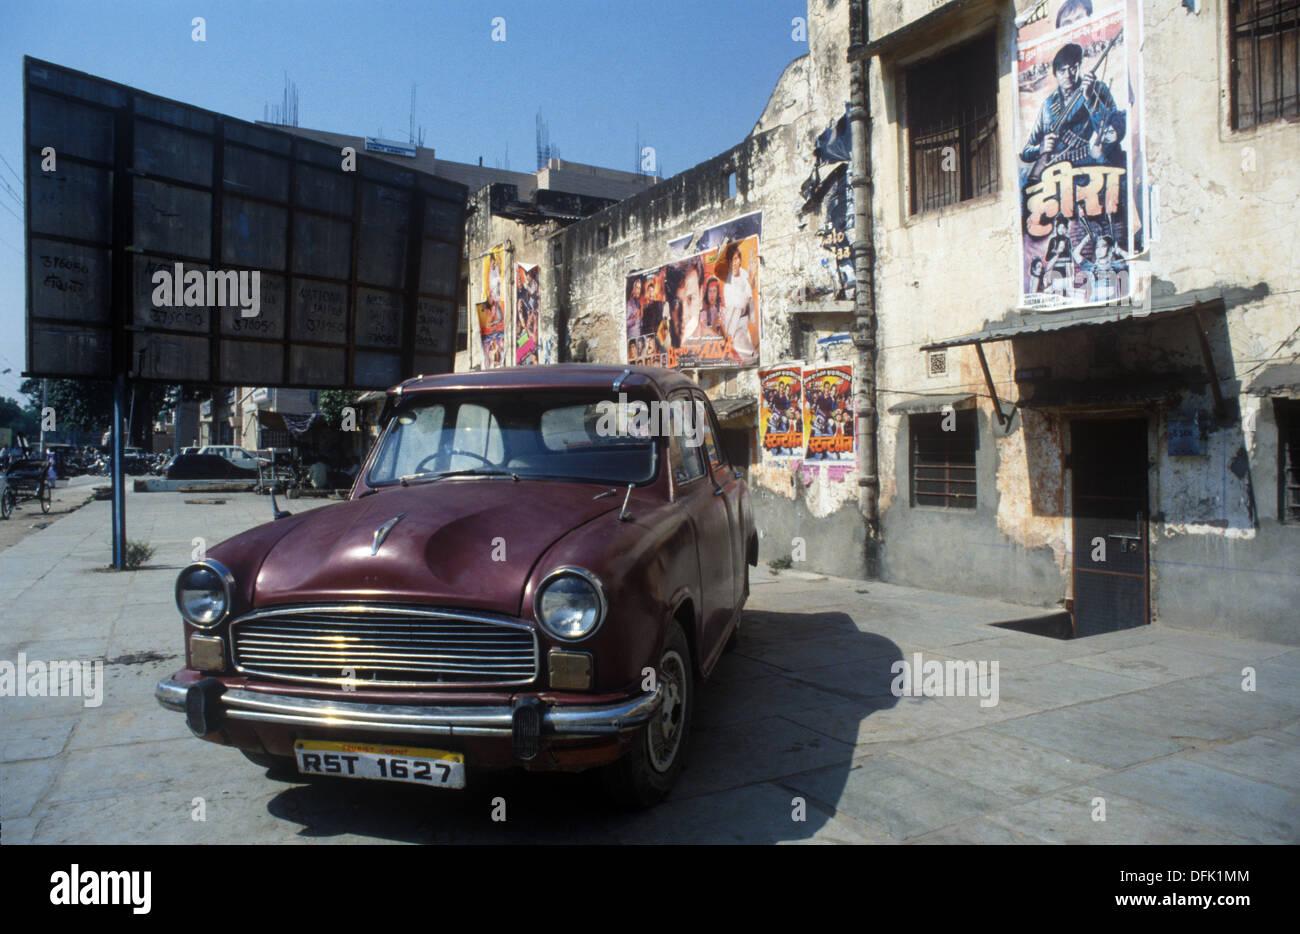 A Hindustan Ambassador car in Jaipur, Rajasthan, India - Stock Image